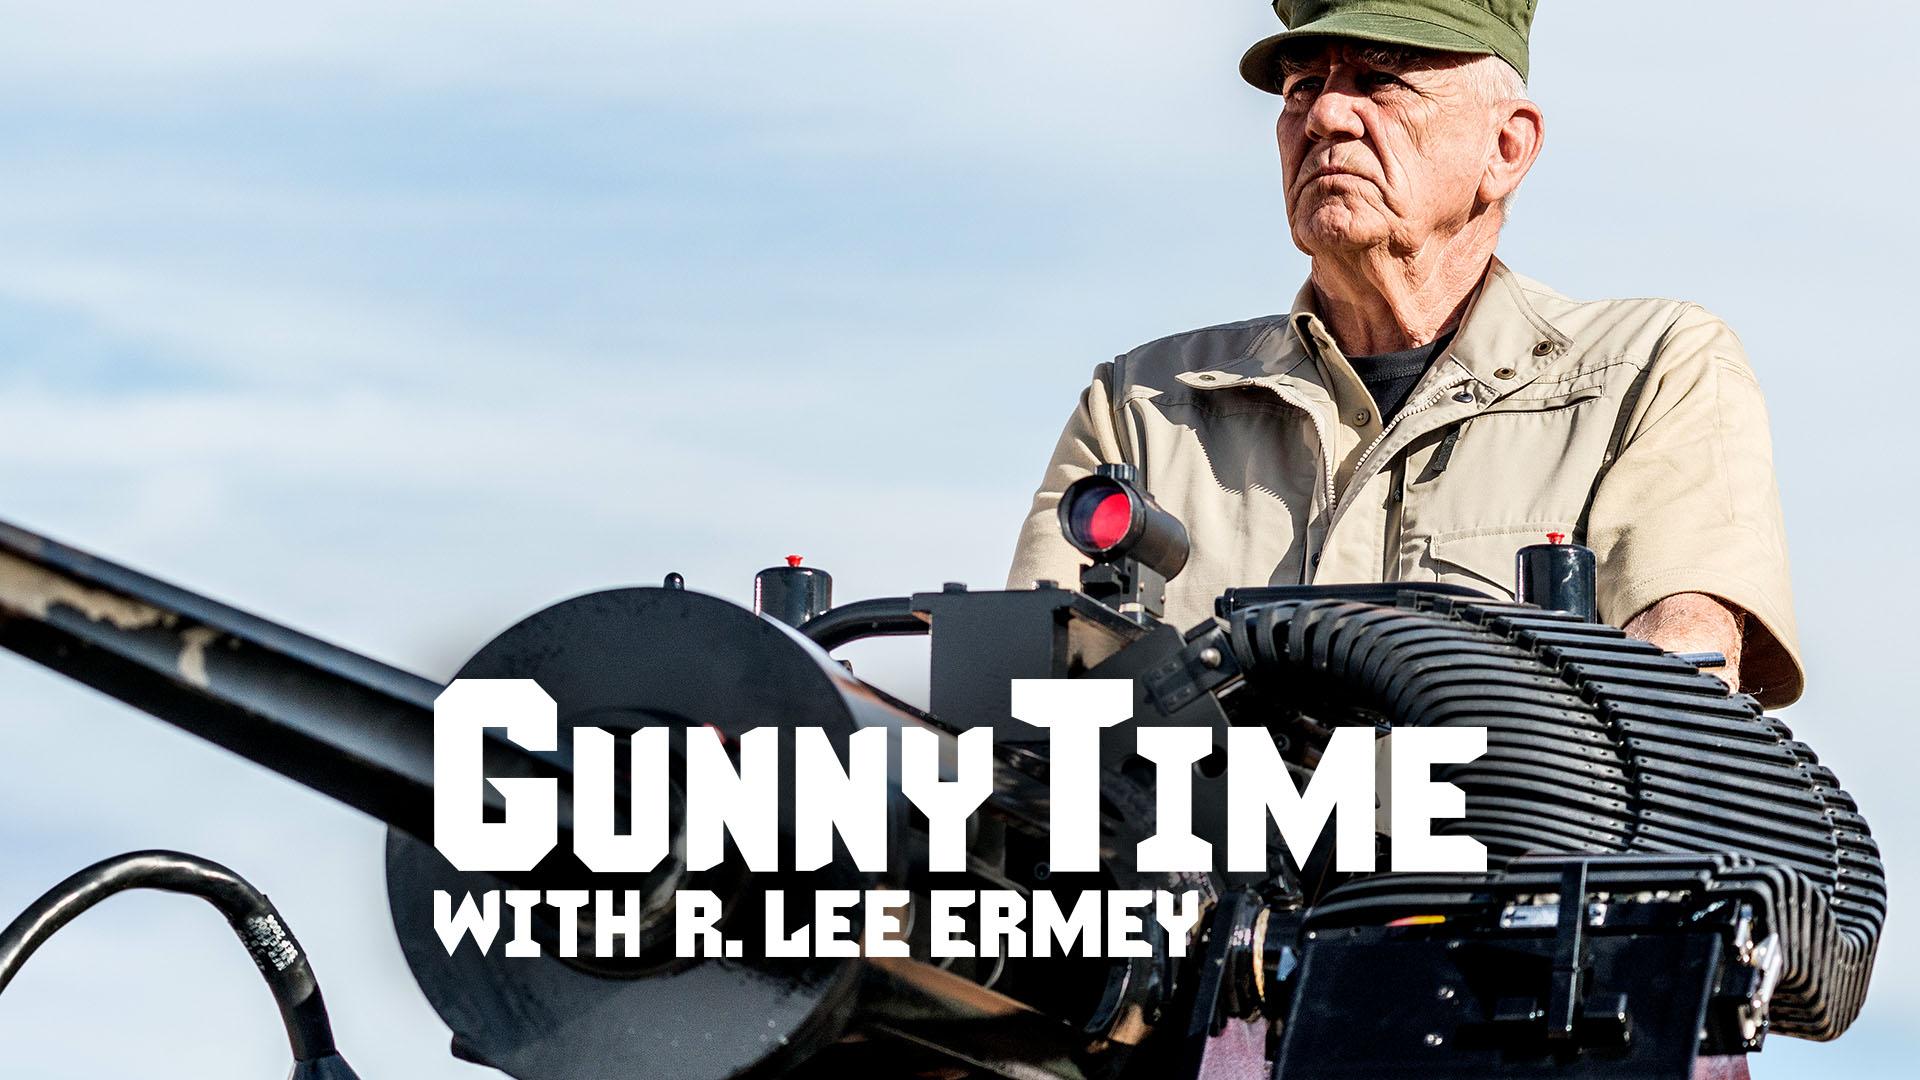 GunnyTime with R. Lee Ermey